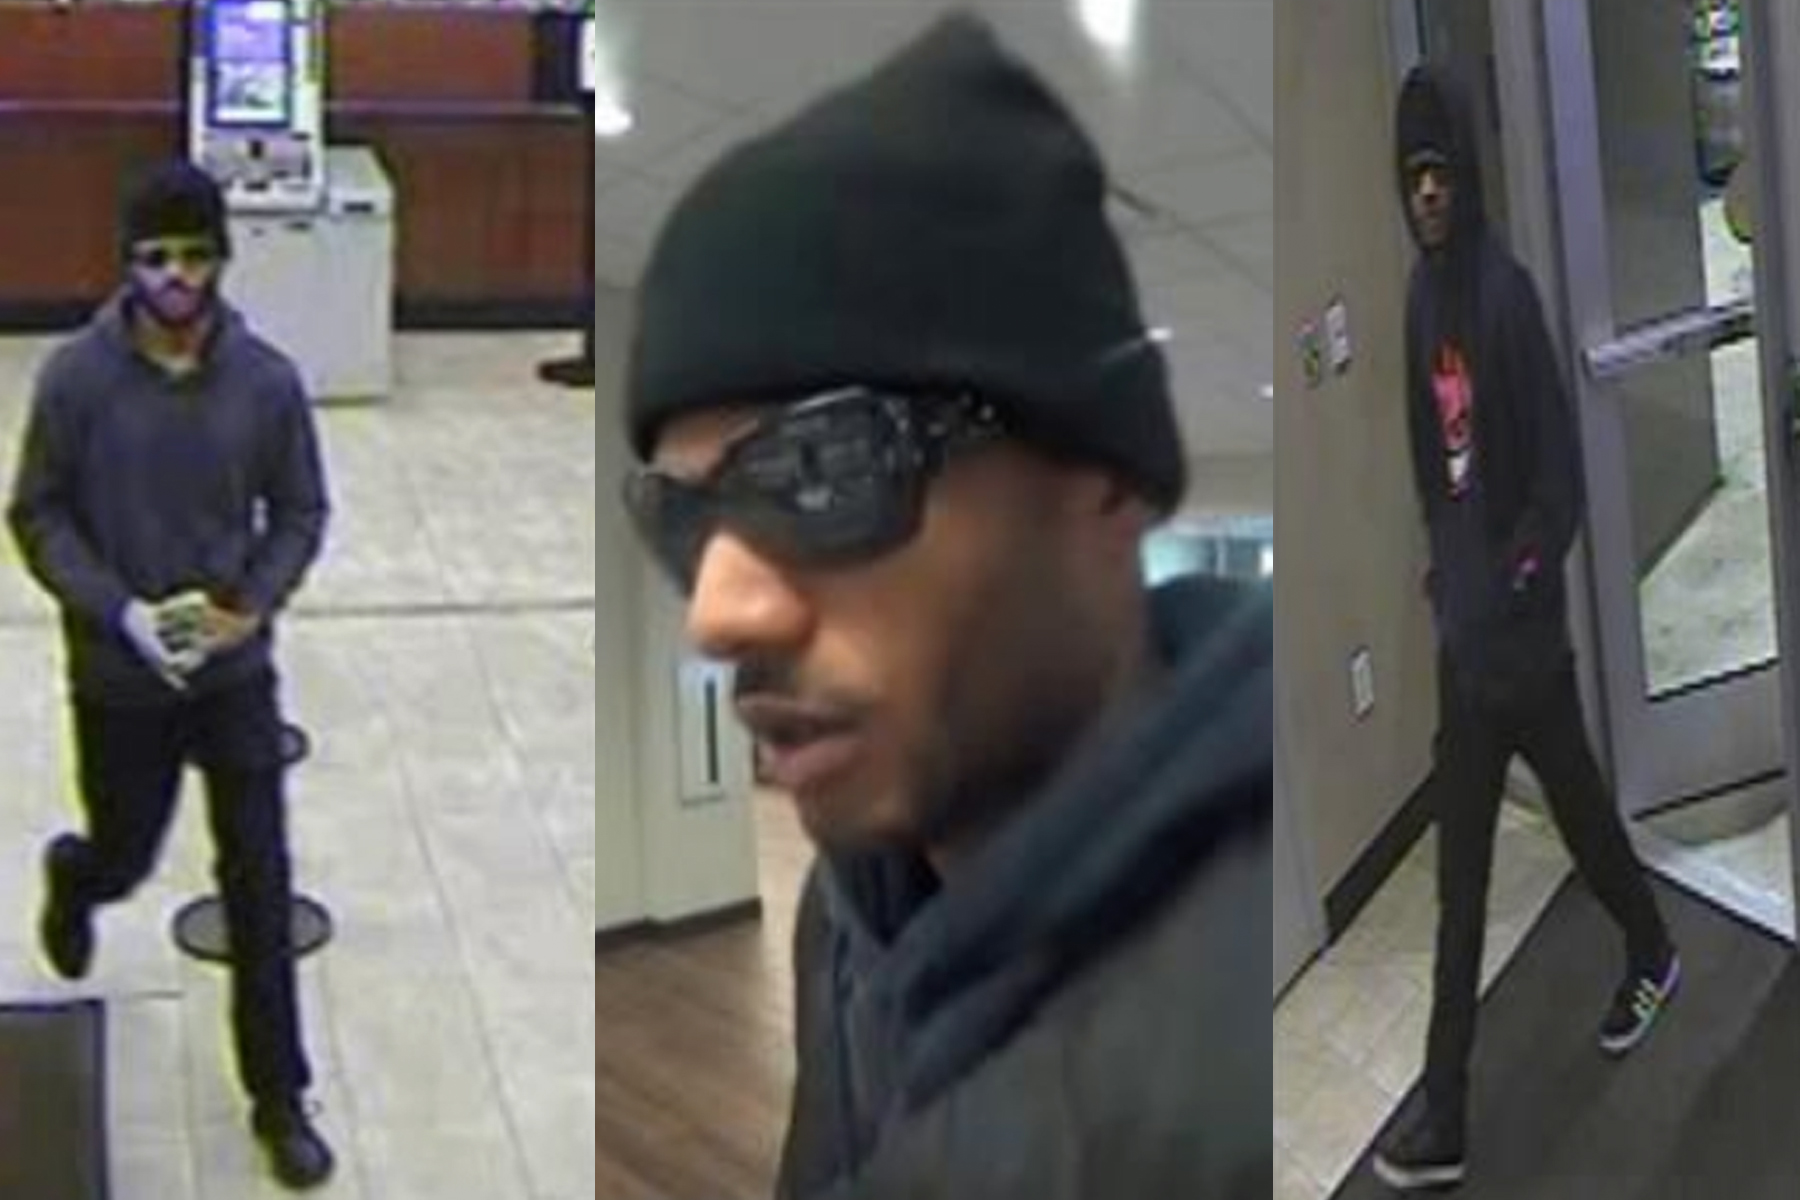 Man accused of robbing five banks on Dec. 16, 2019. (Credit: LAPD)